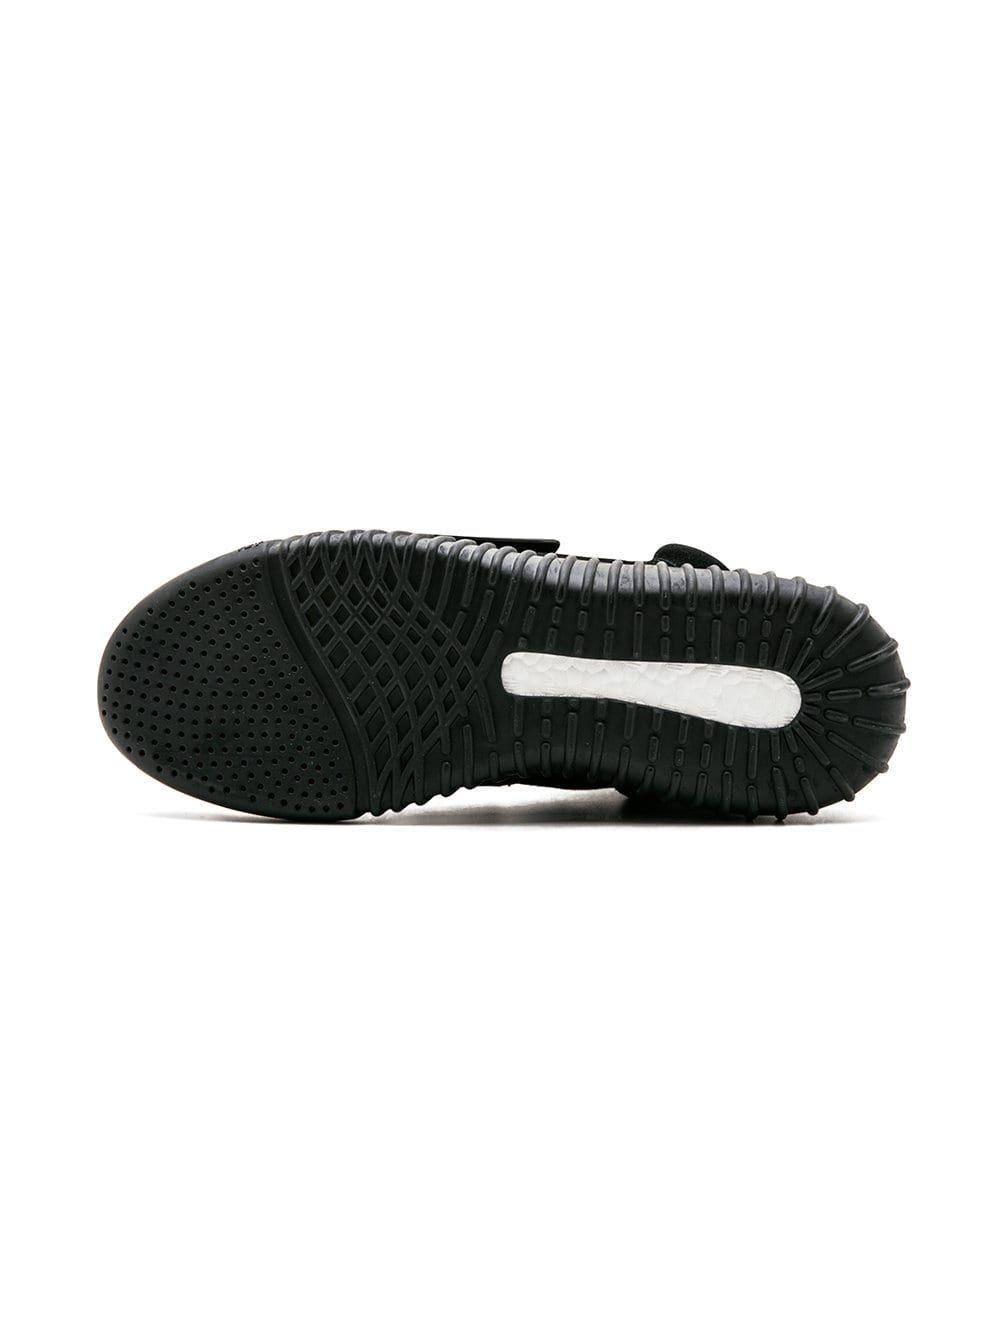 96730e45257f0 Shoes by Adidas x Yeezy 750 Boost en daim noir Yeezy.